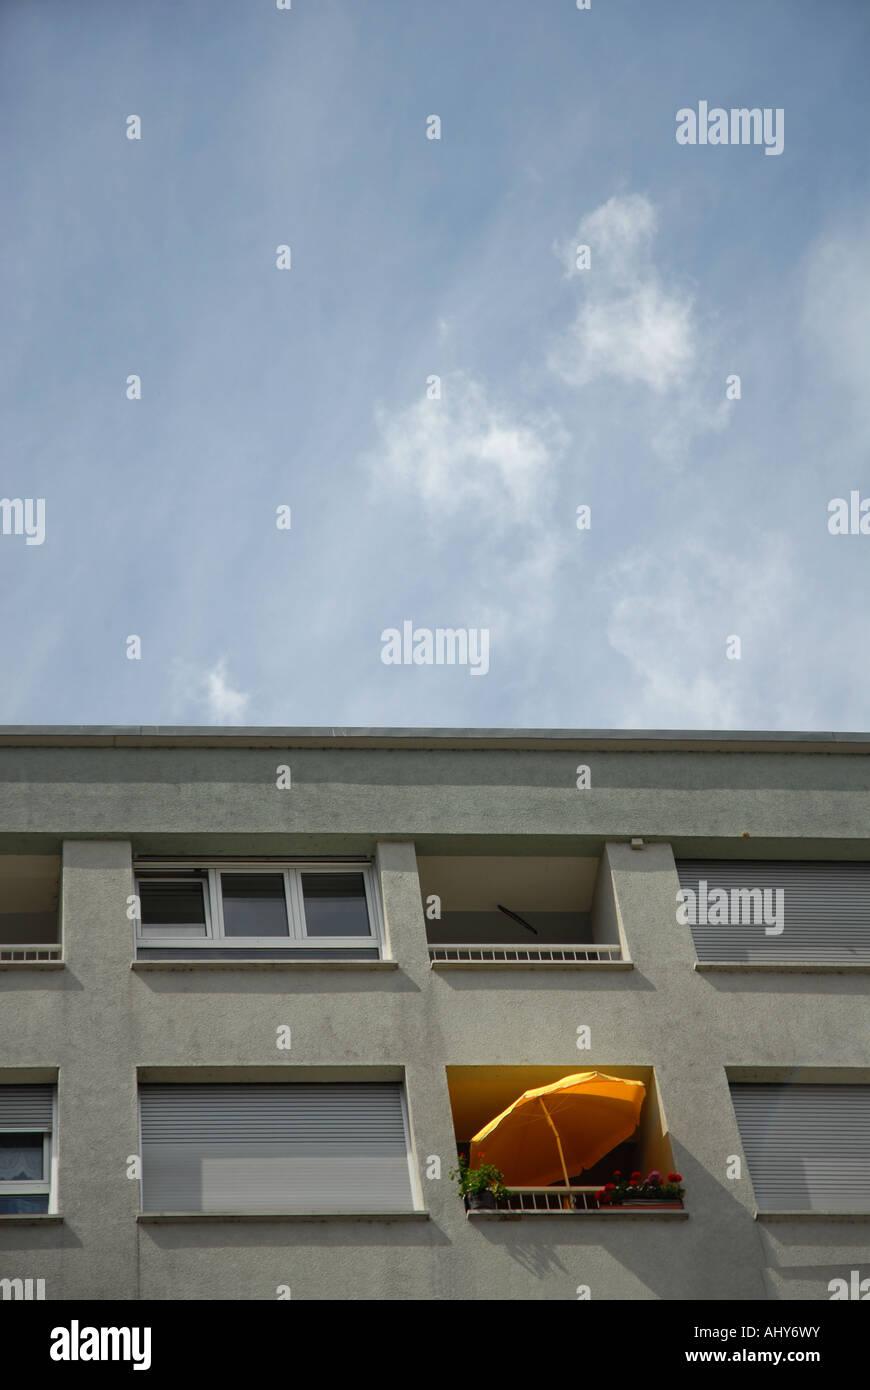 balcony with sunshade in a block rental Stock Photo